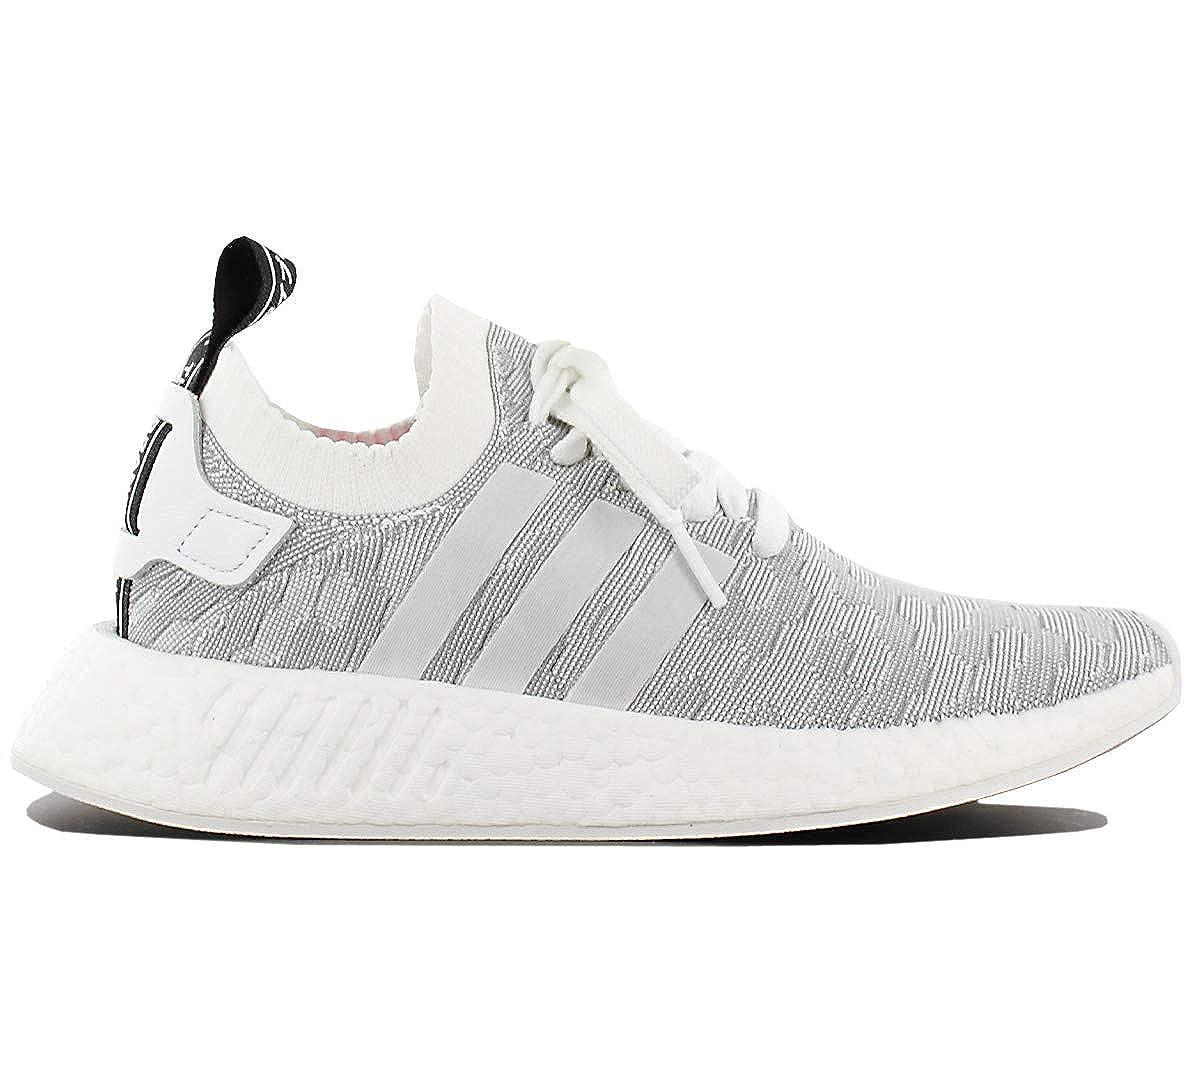 Adidas Originals NMD R2 PK W BY9520 Damen Schuhe Weiß-Grau Gr. EU 40 UK 6.5